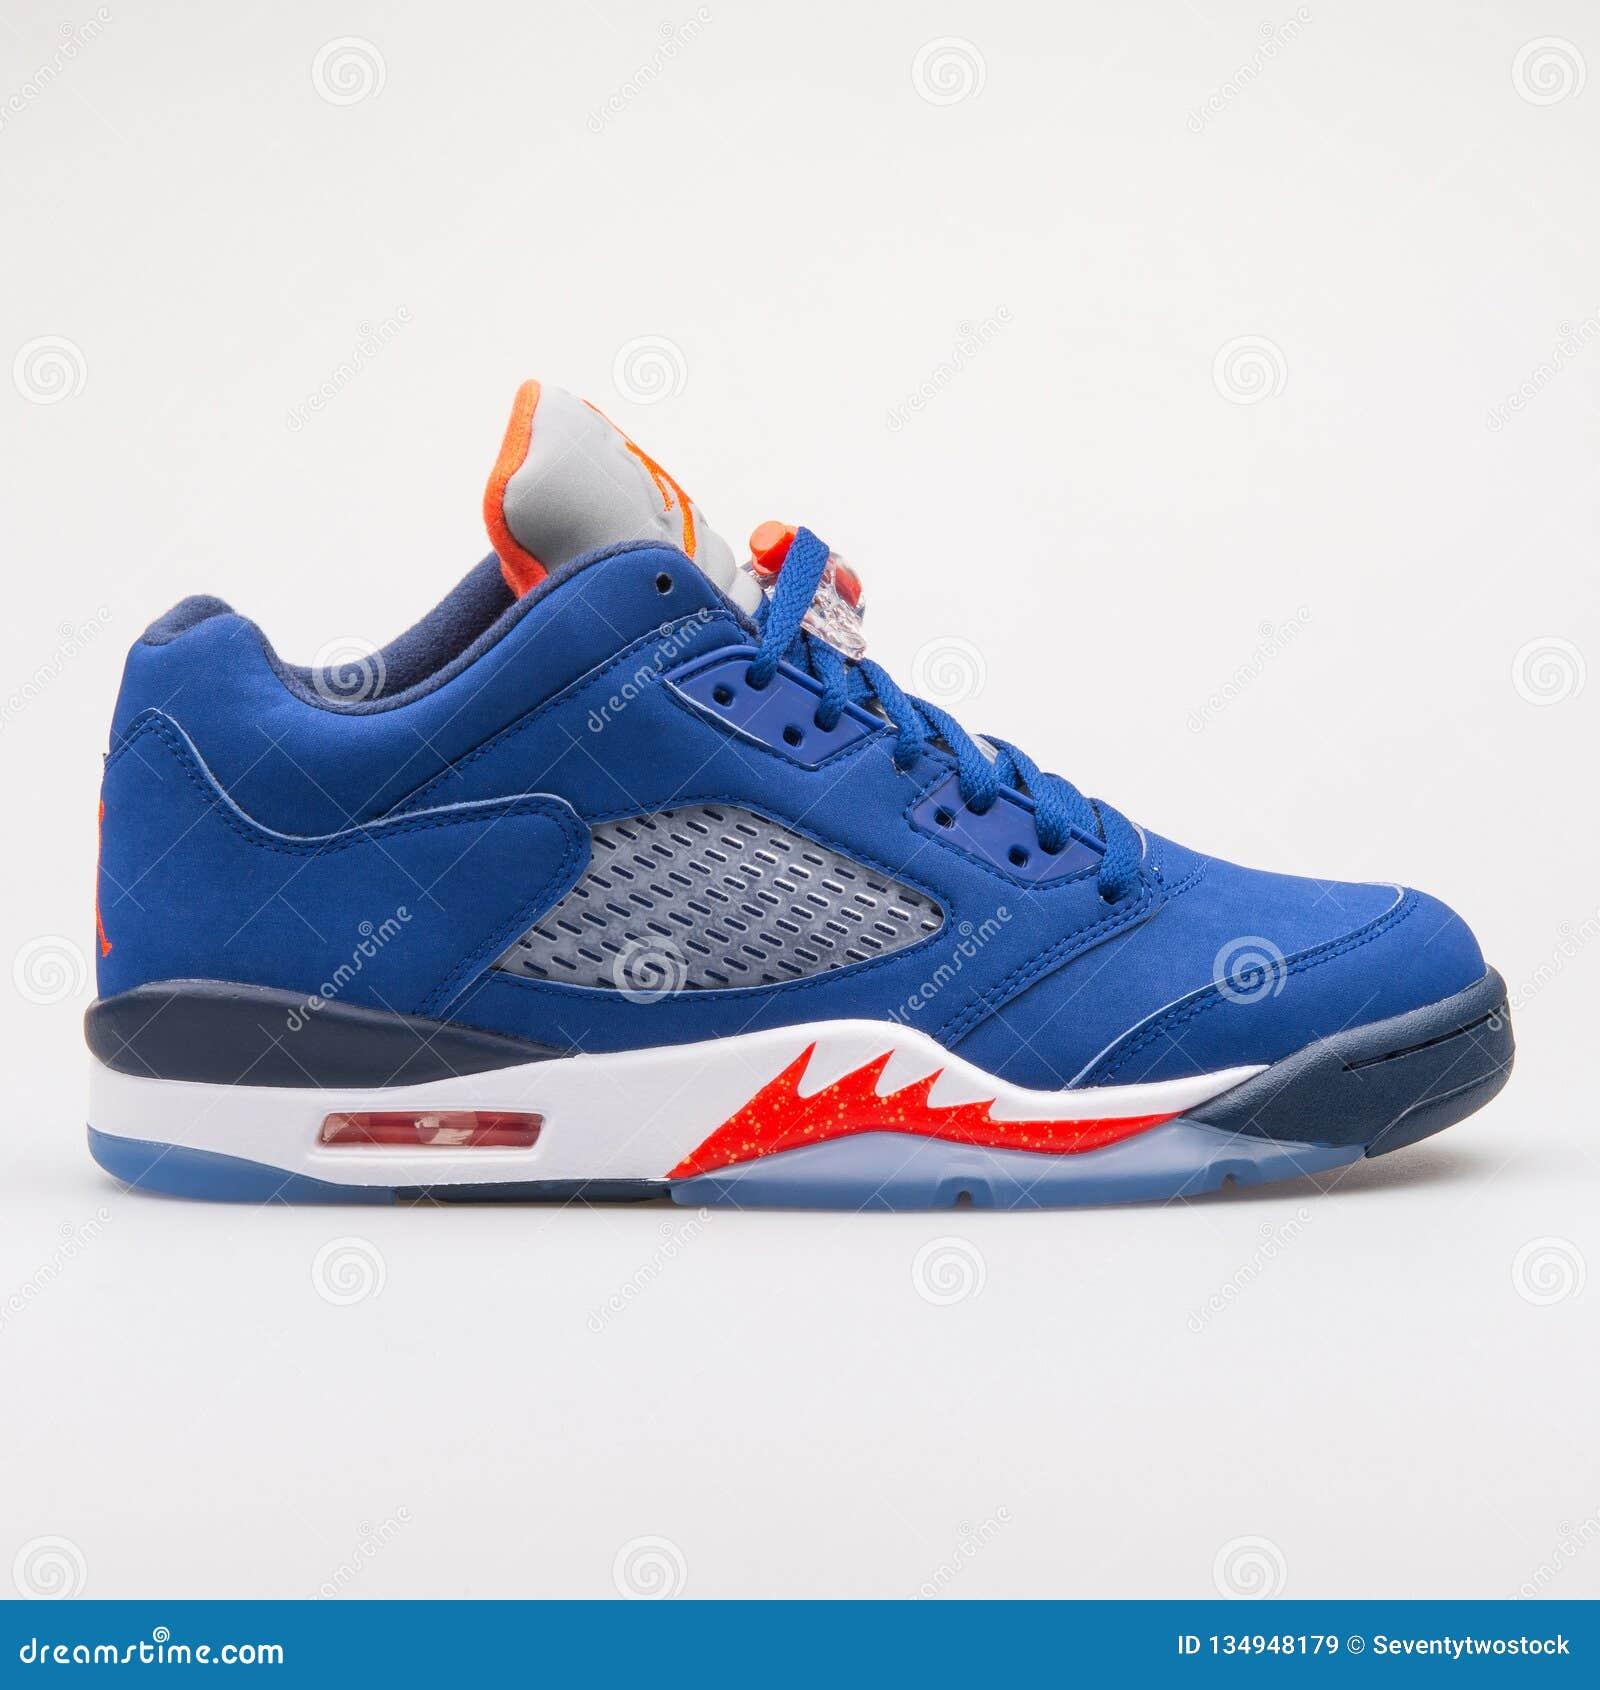 best loved aff8e 98f35 Nike Air Jordan 5 Retro Low Knicks Blue Sneaker Editorial ...